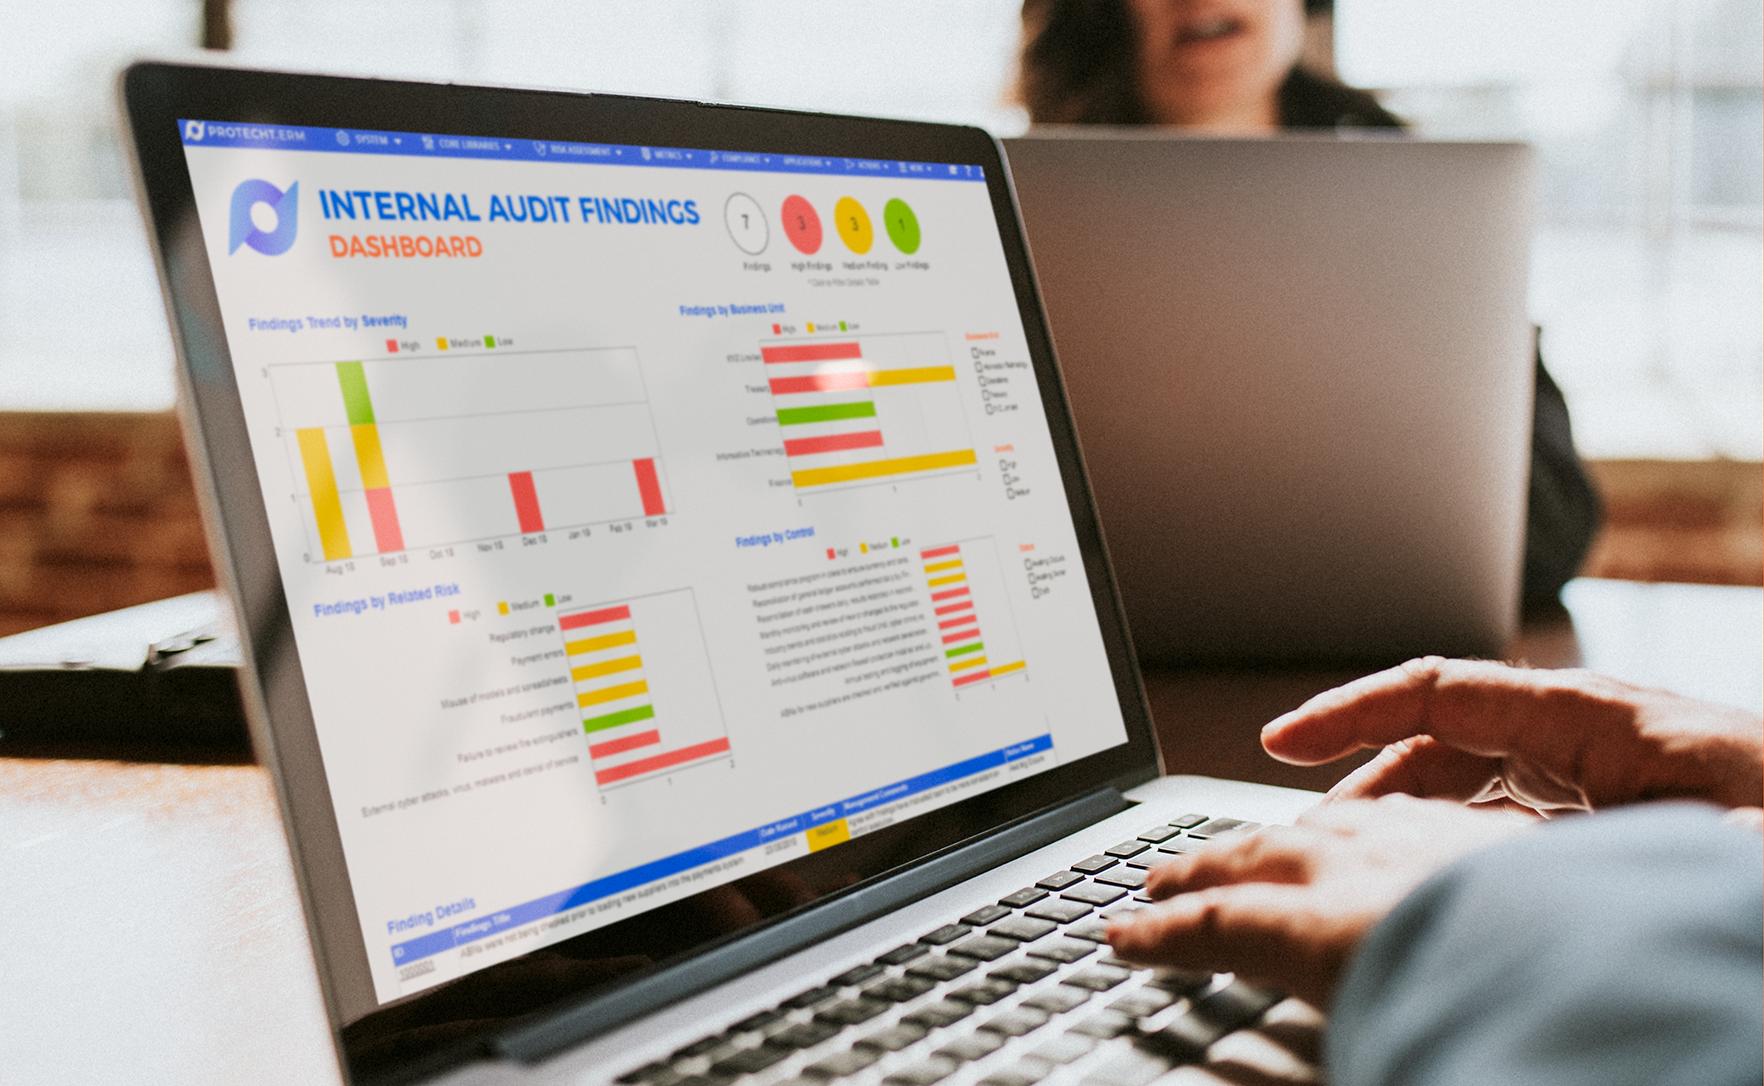 Protecht-internal-audit-findings-dashboard